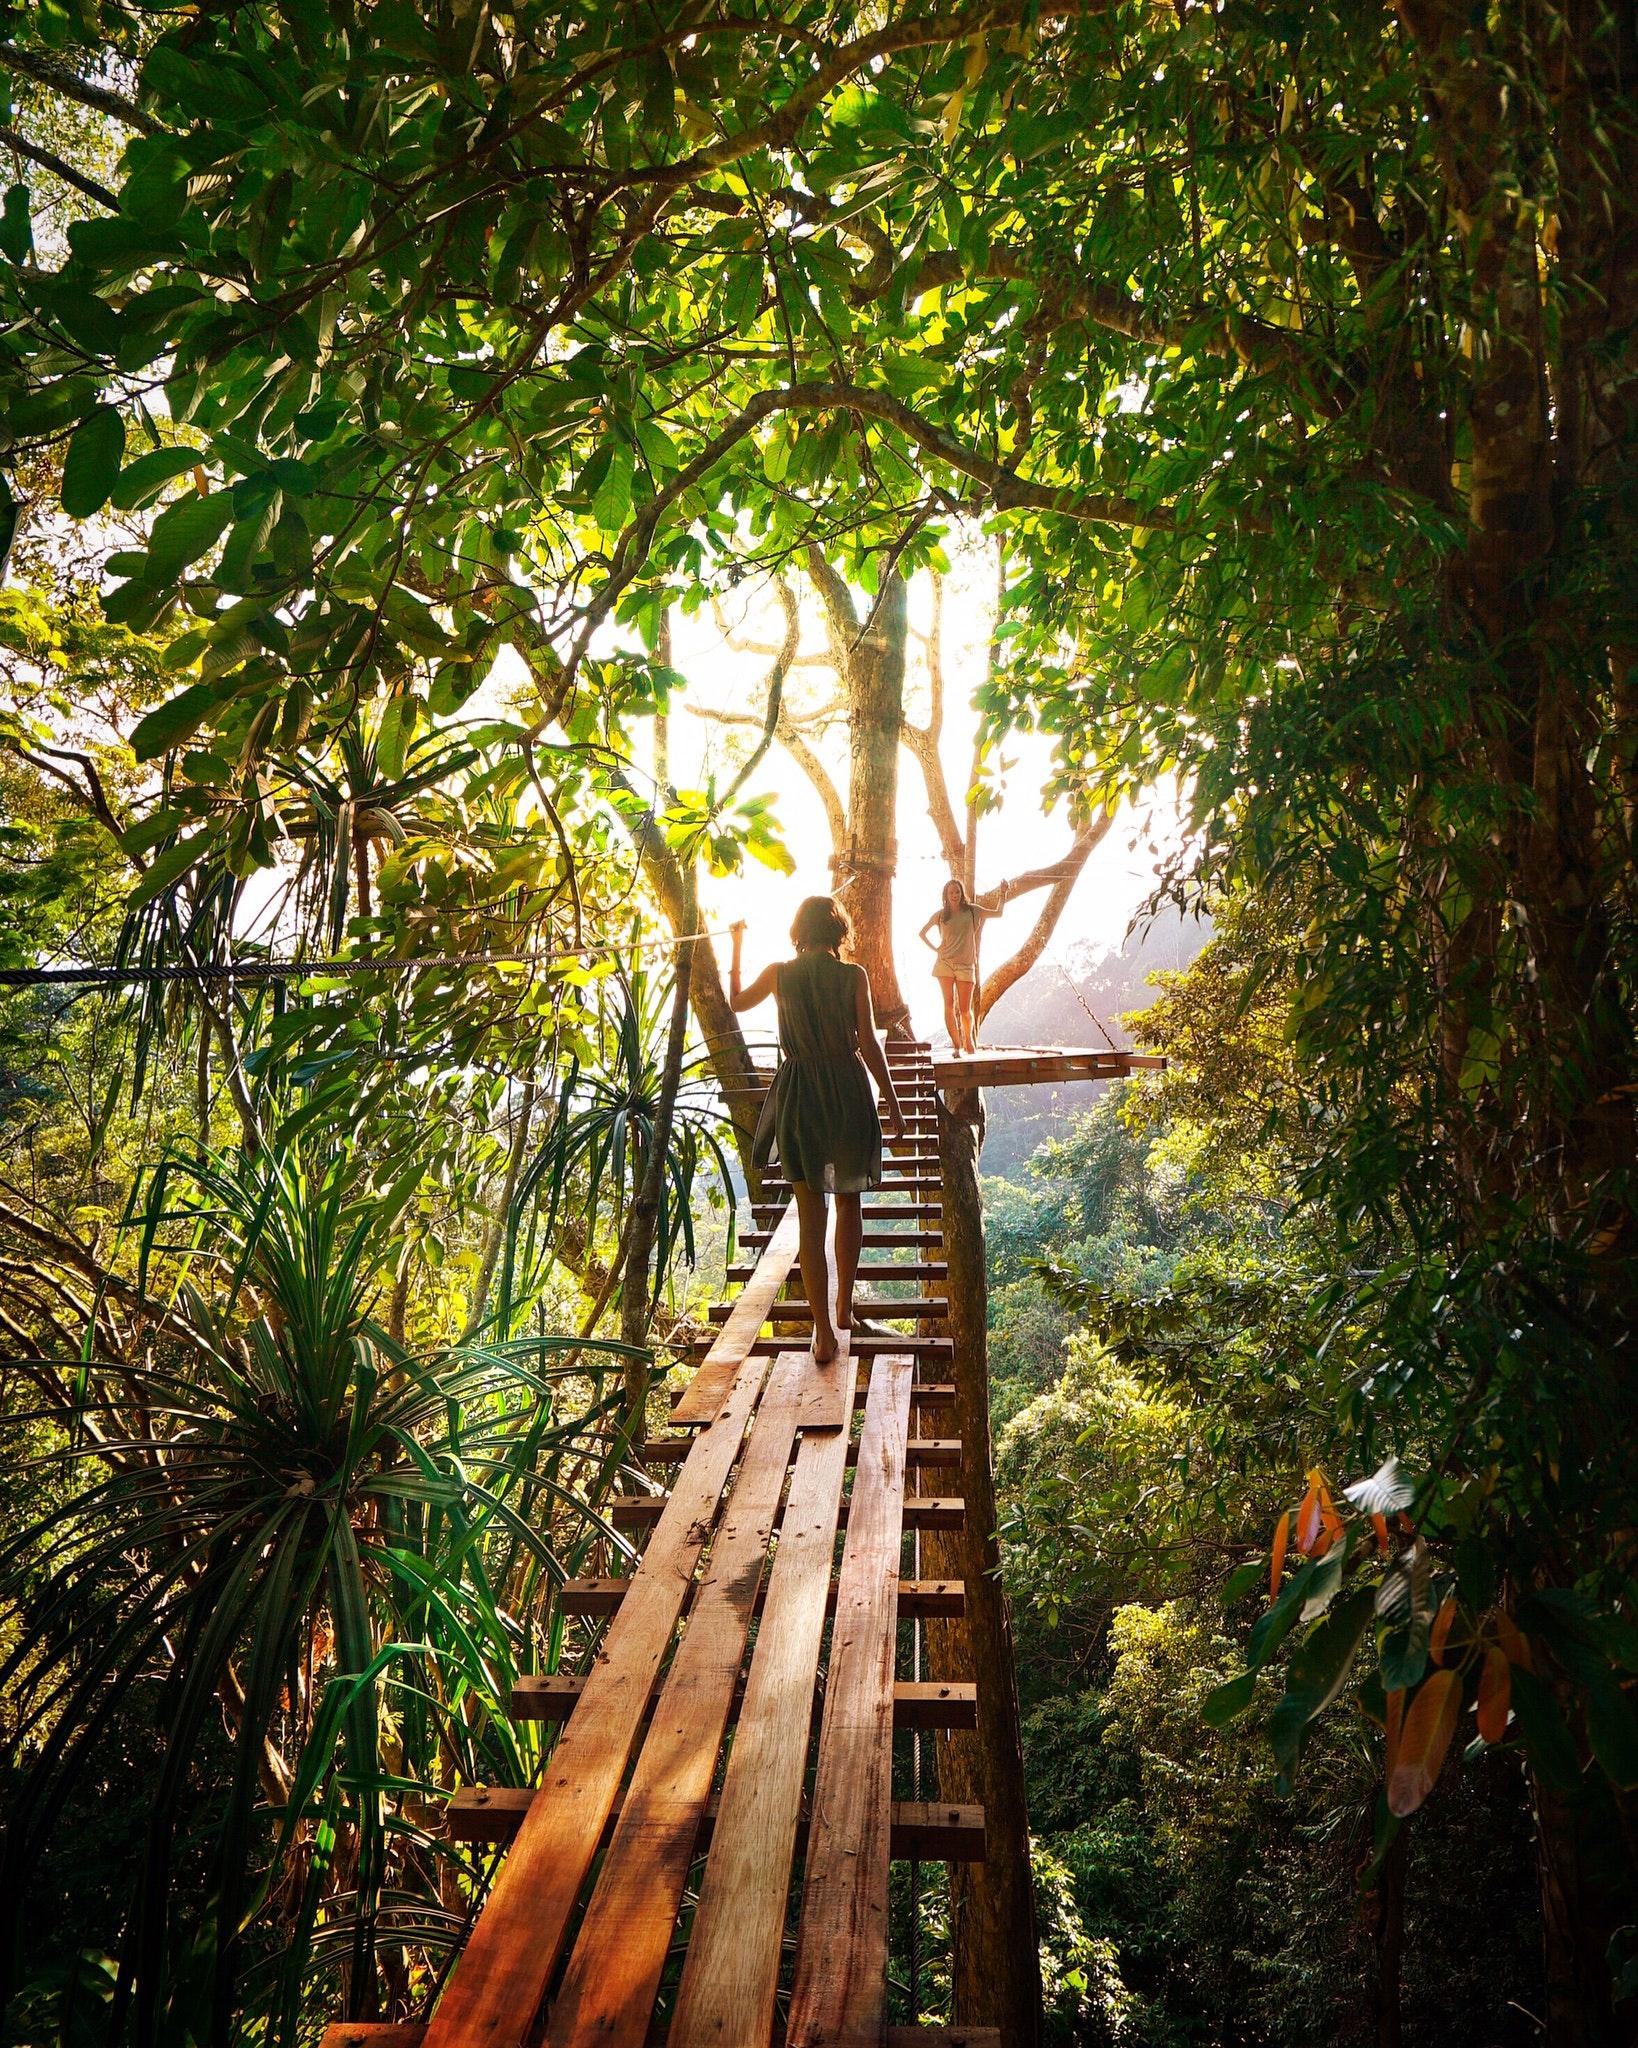 adventure-boardwalk-branch-238631.jpg